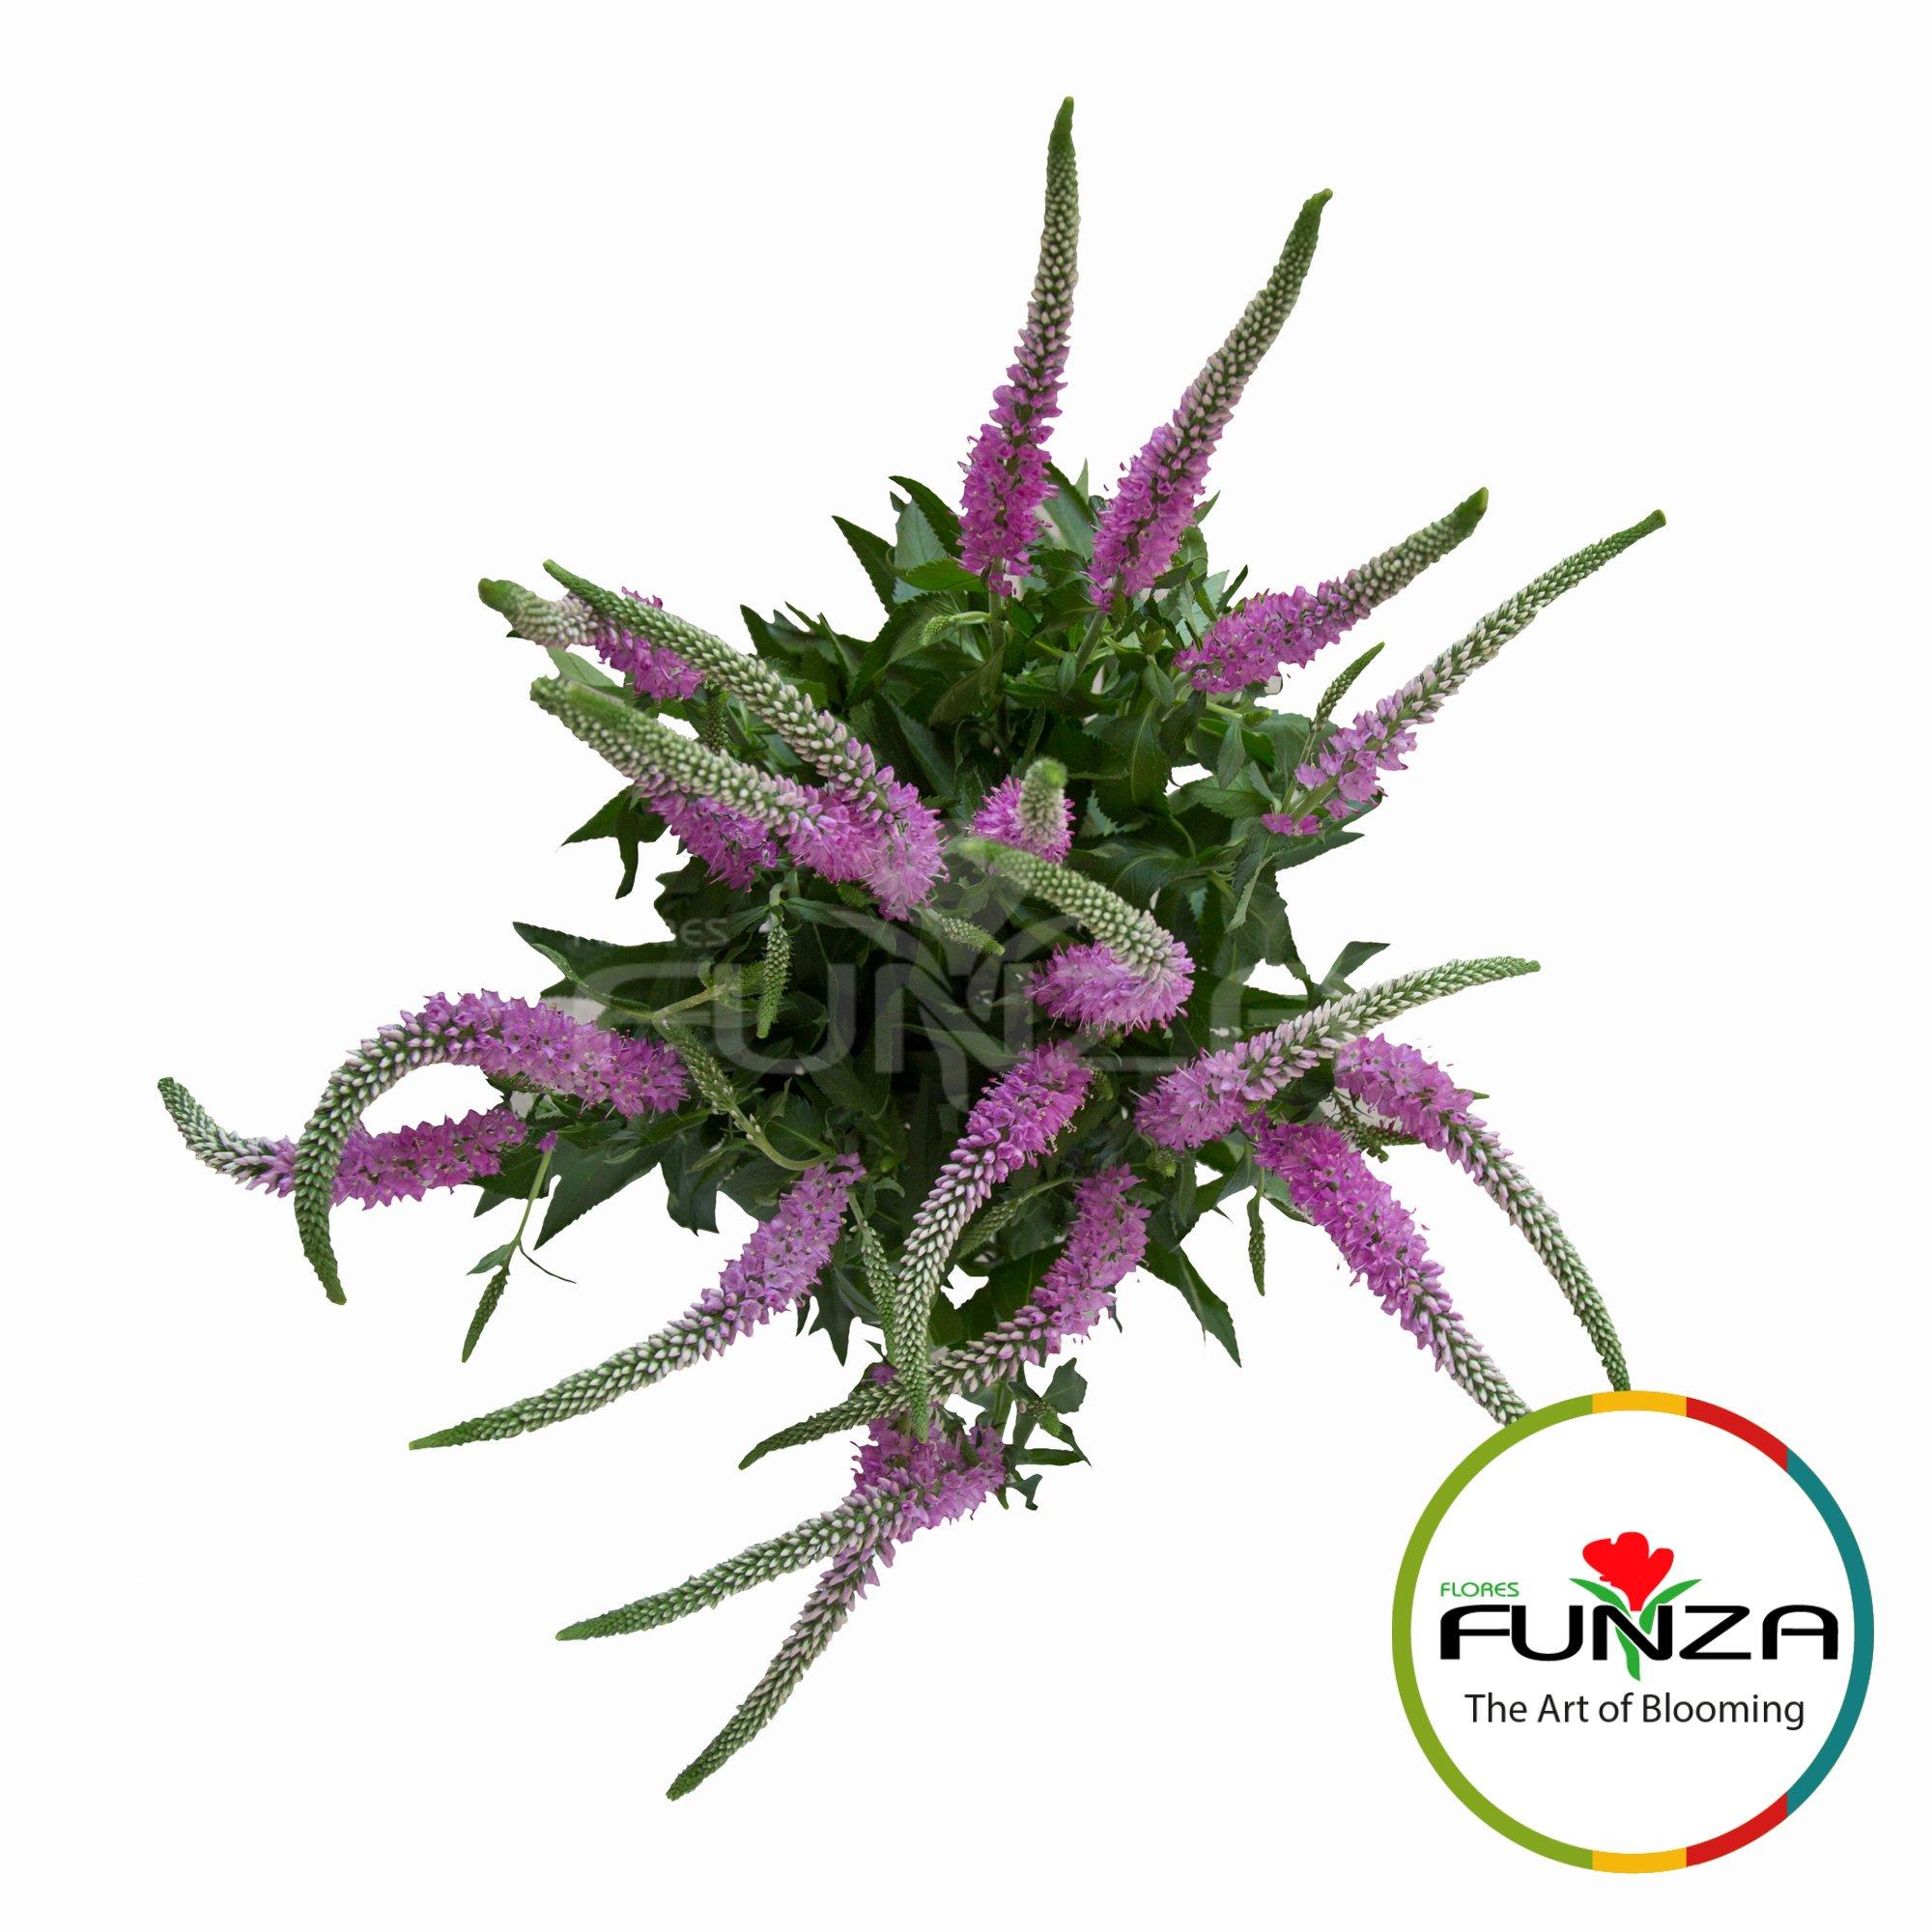 Veronica Pink -  Flores Funza (2)